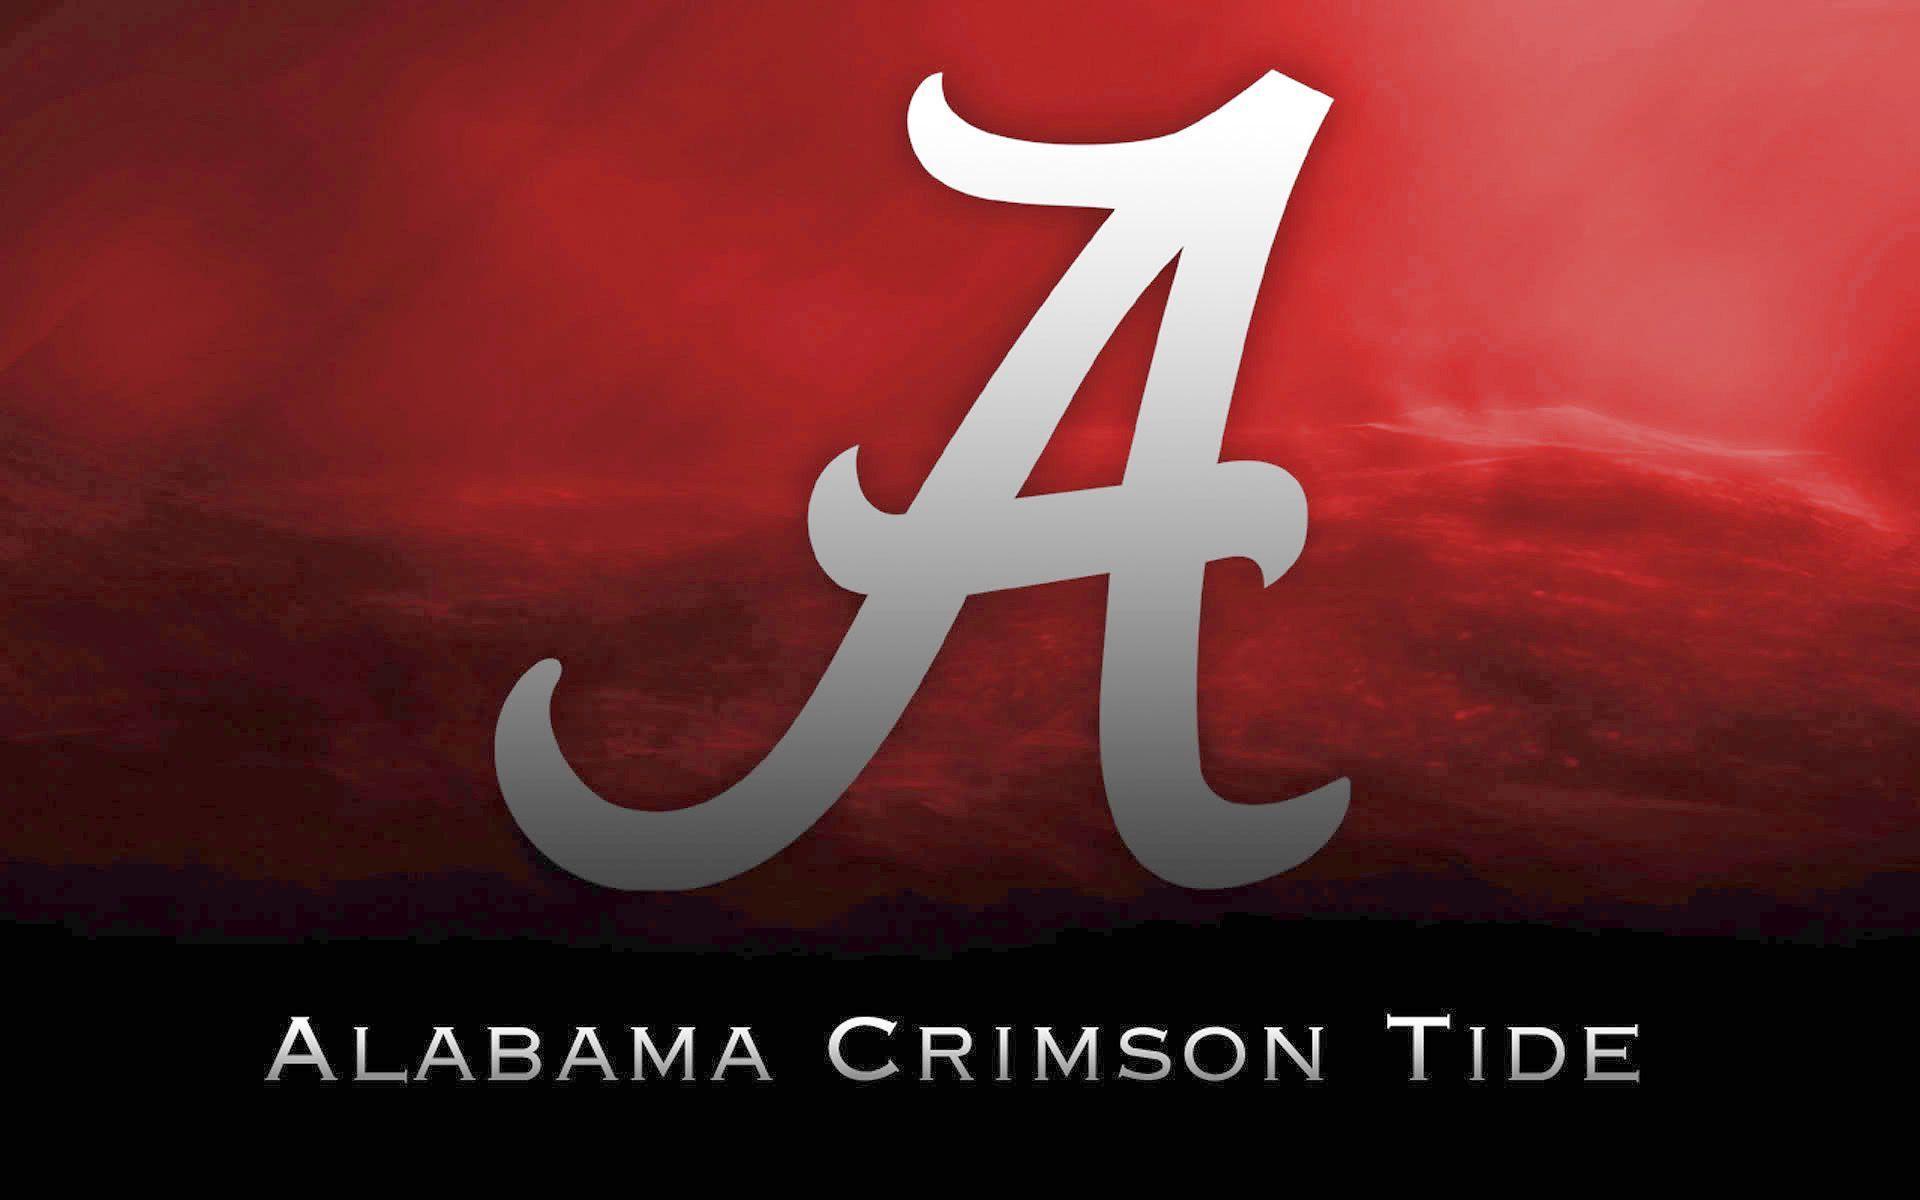 Free Alabama Crimson Tide Wallpapers Wallpaper Cave